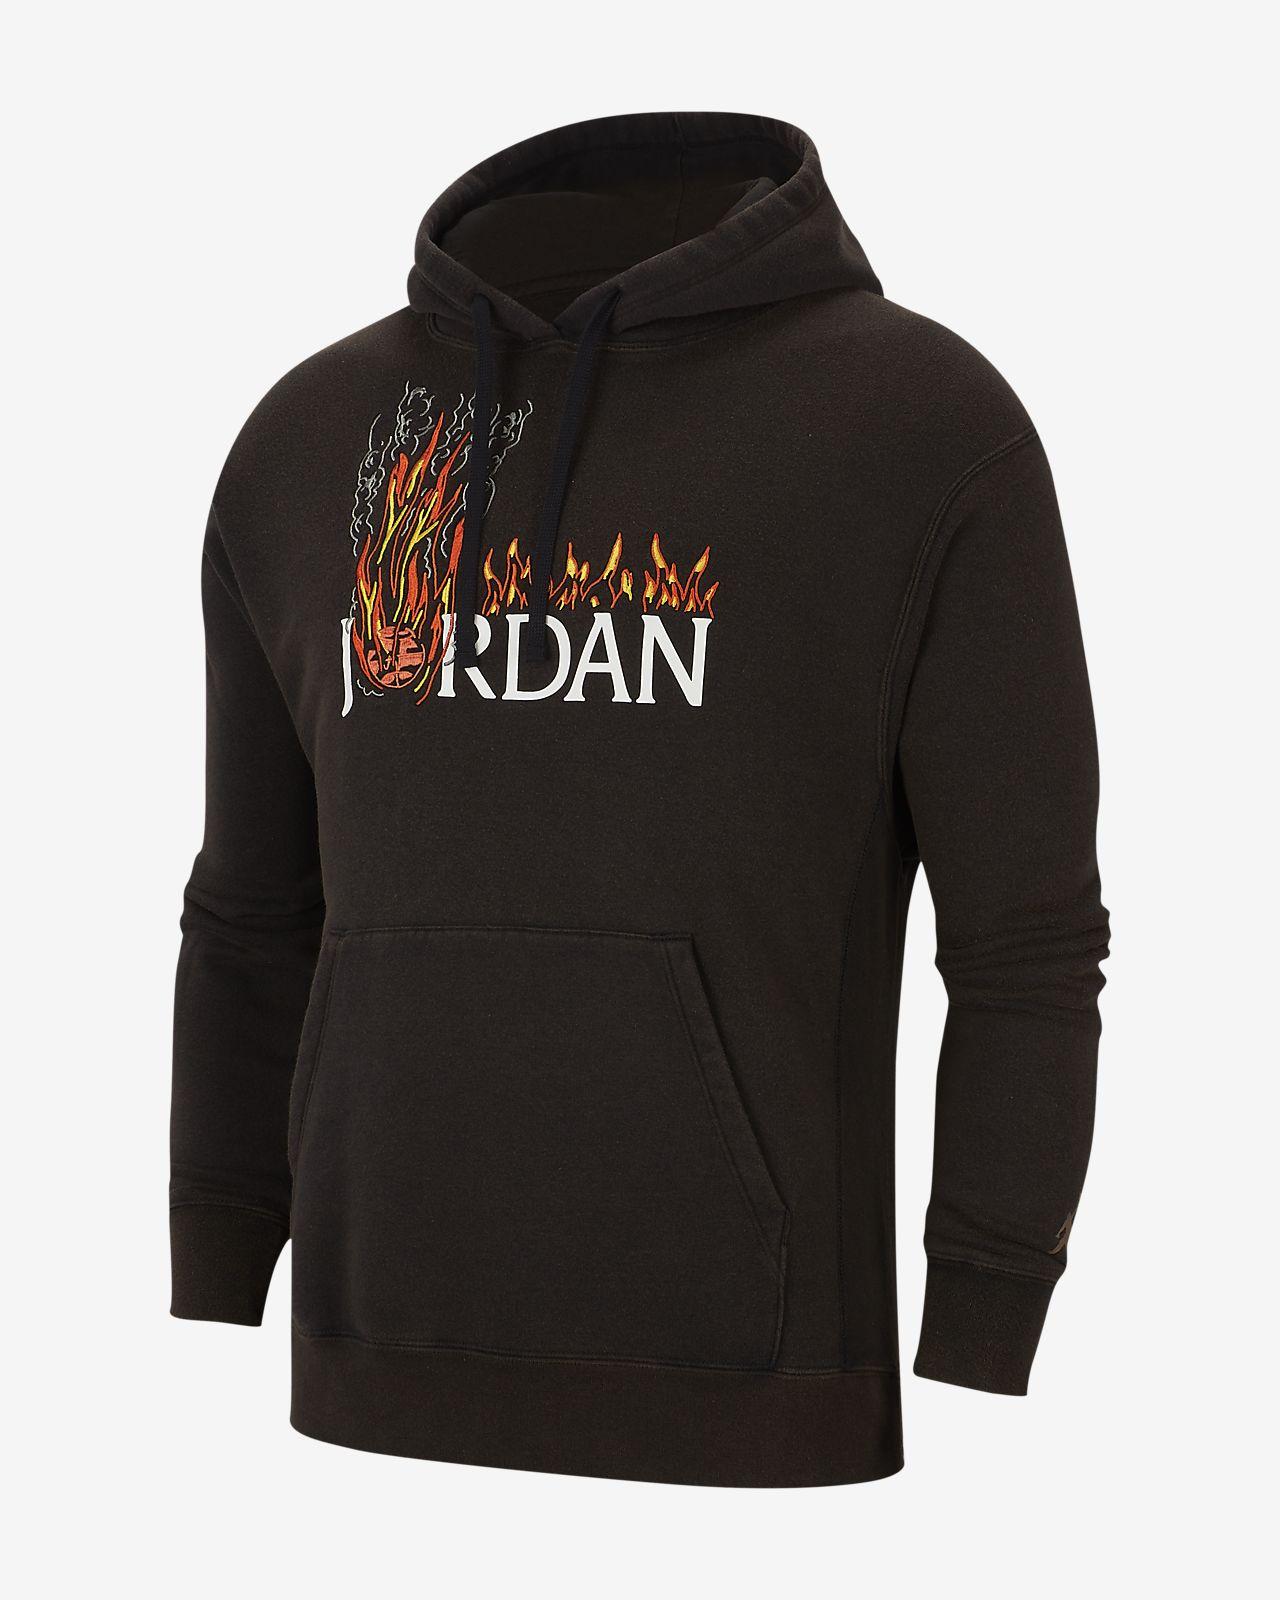 0c0ce598895b44 Jordan x Travis Scott Men s Fleece Hoodie. Nike.com IE